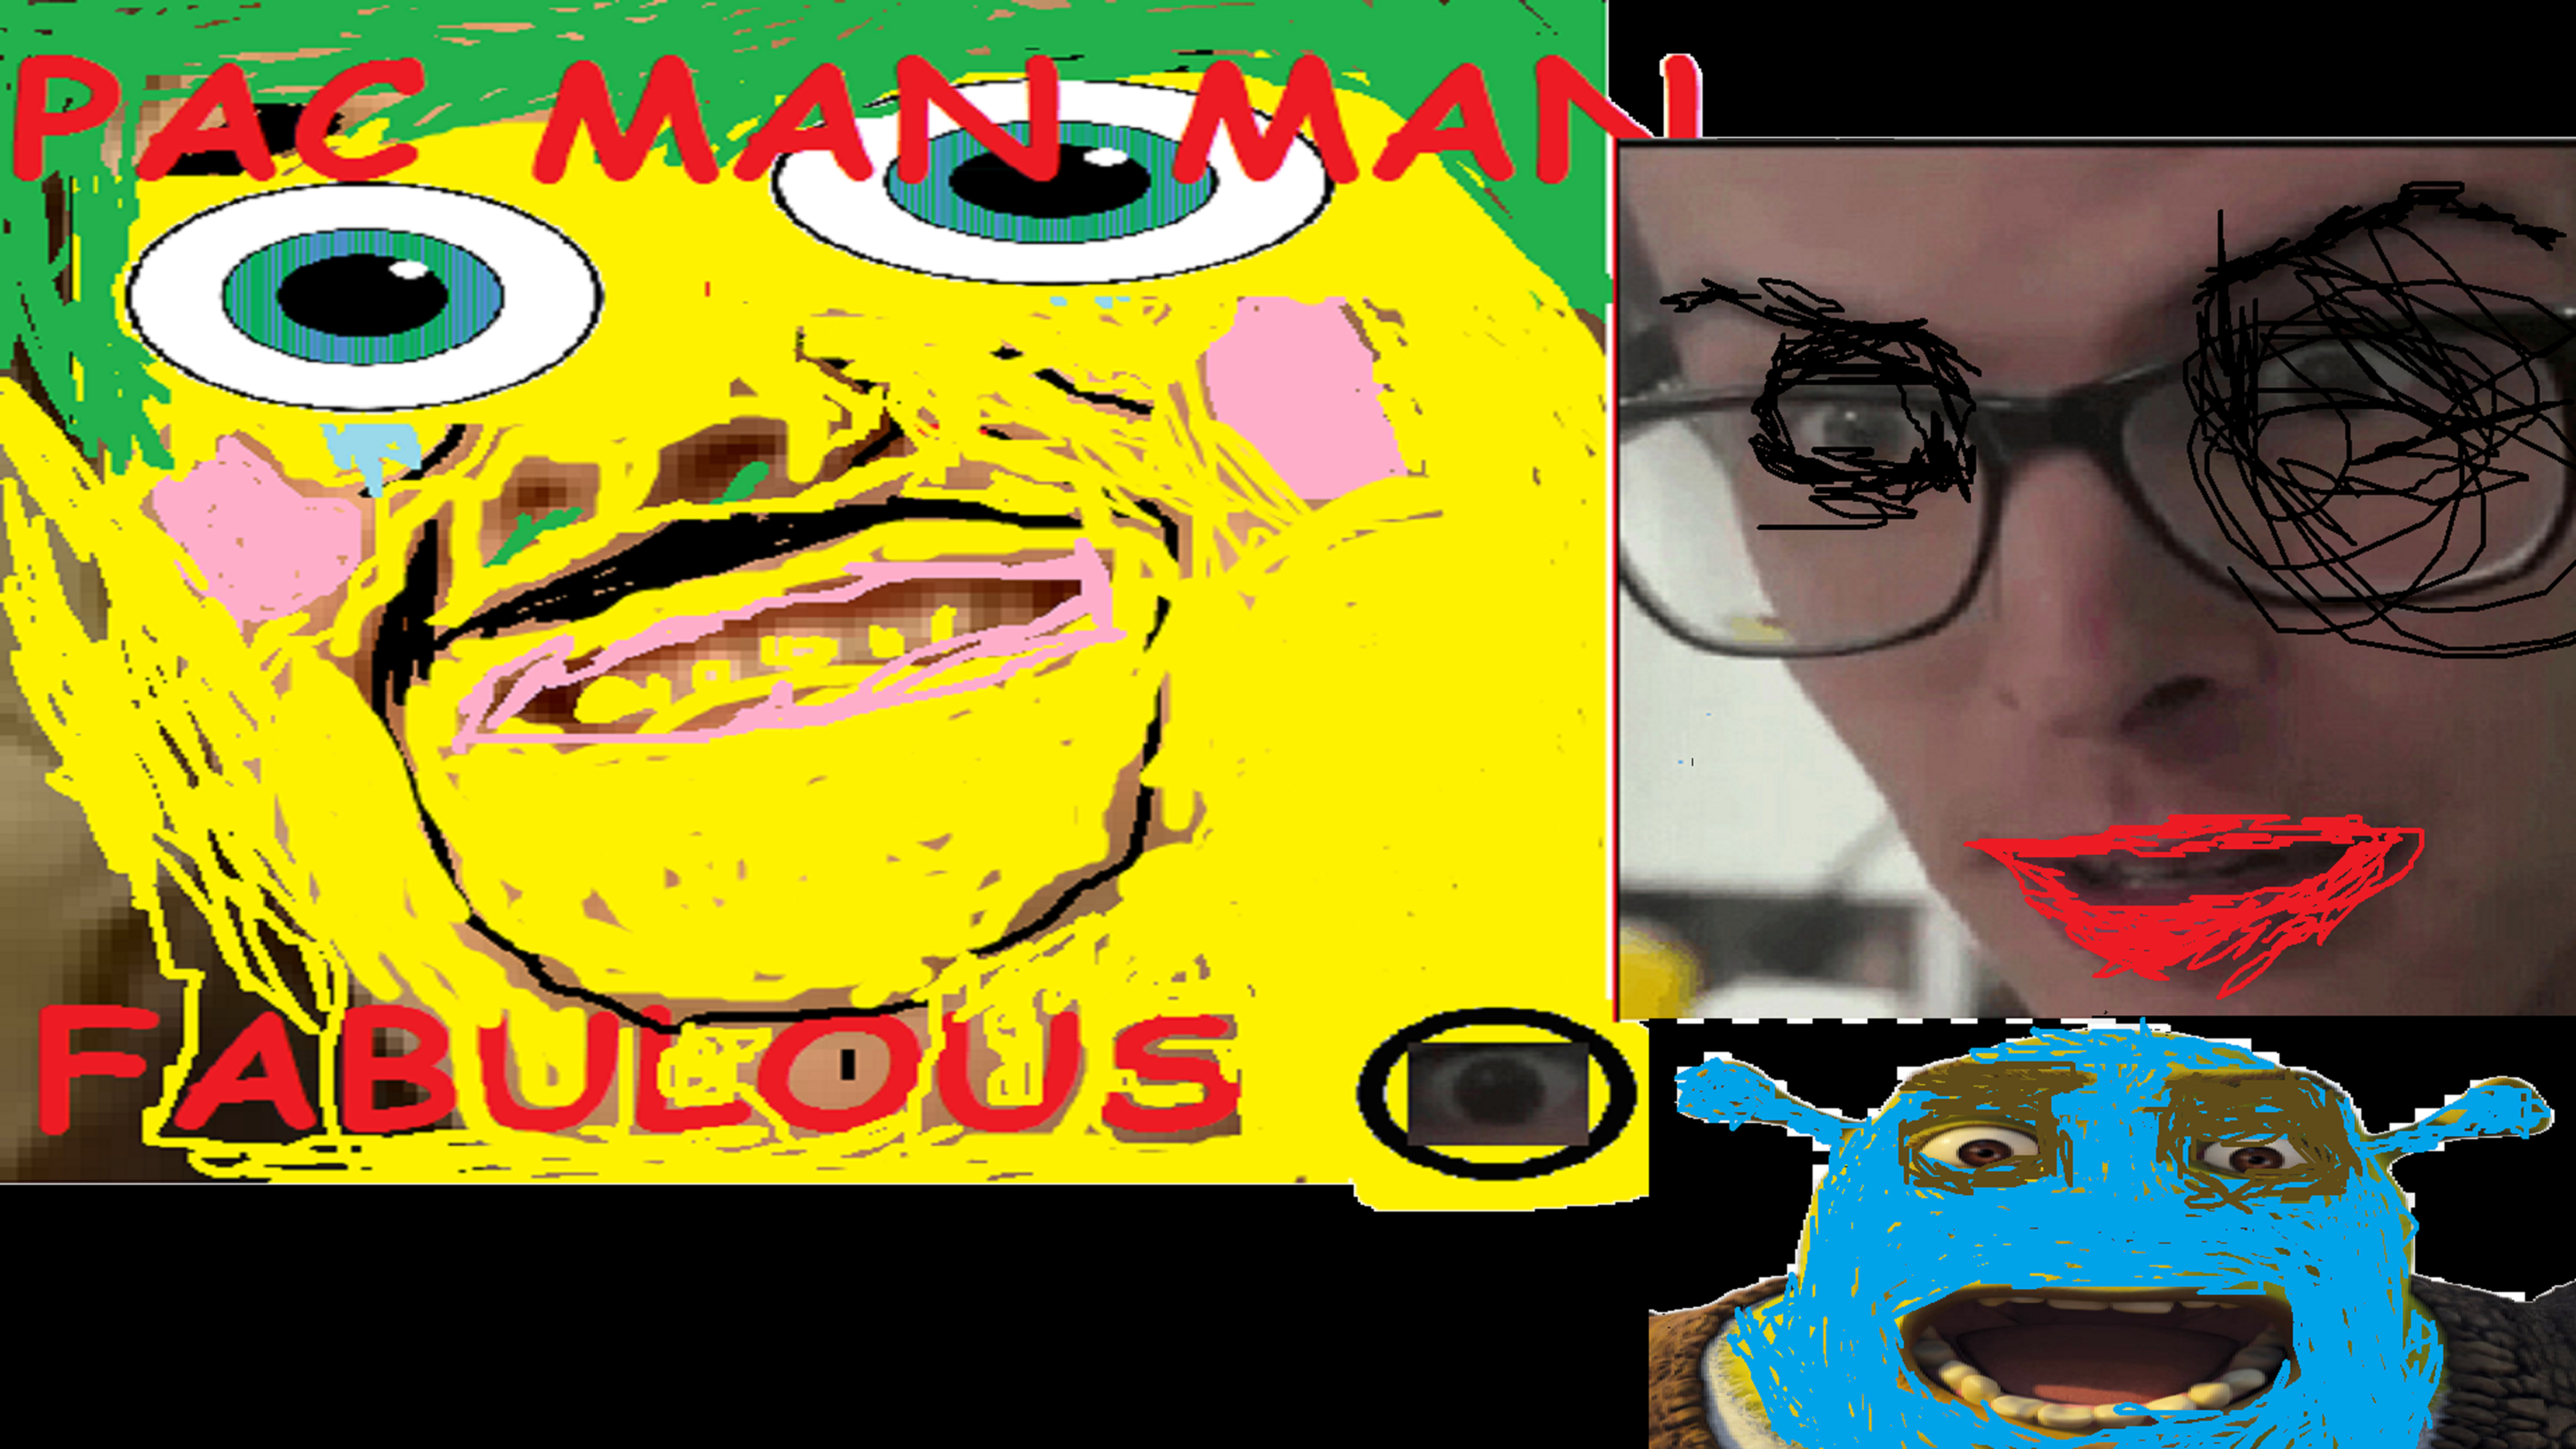 My Dank Meme Wallpaper 7680x4320